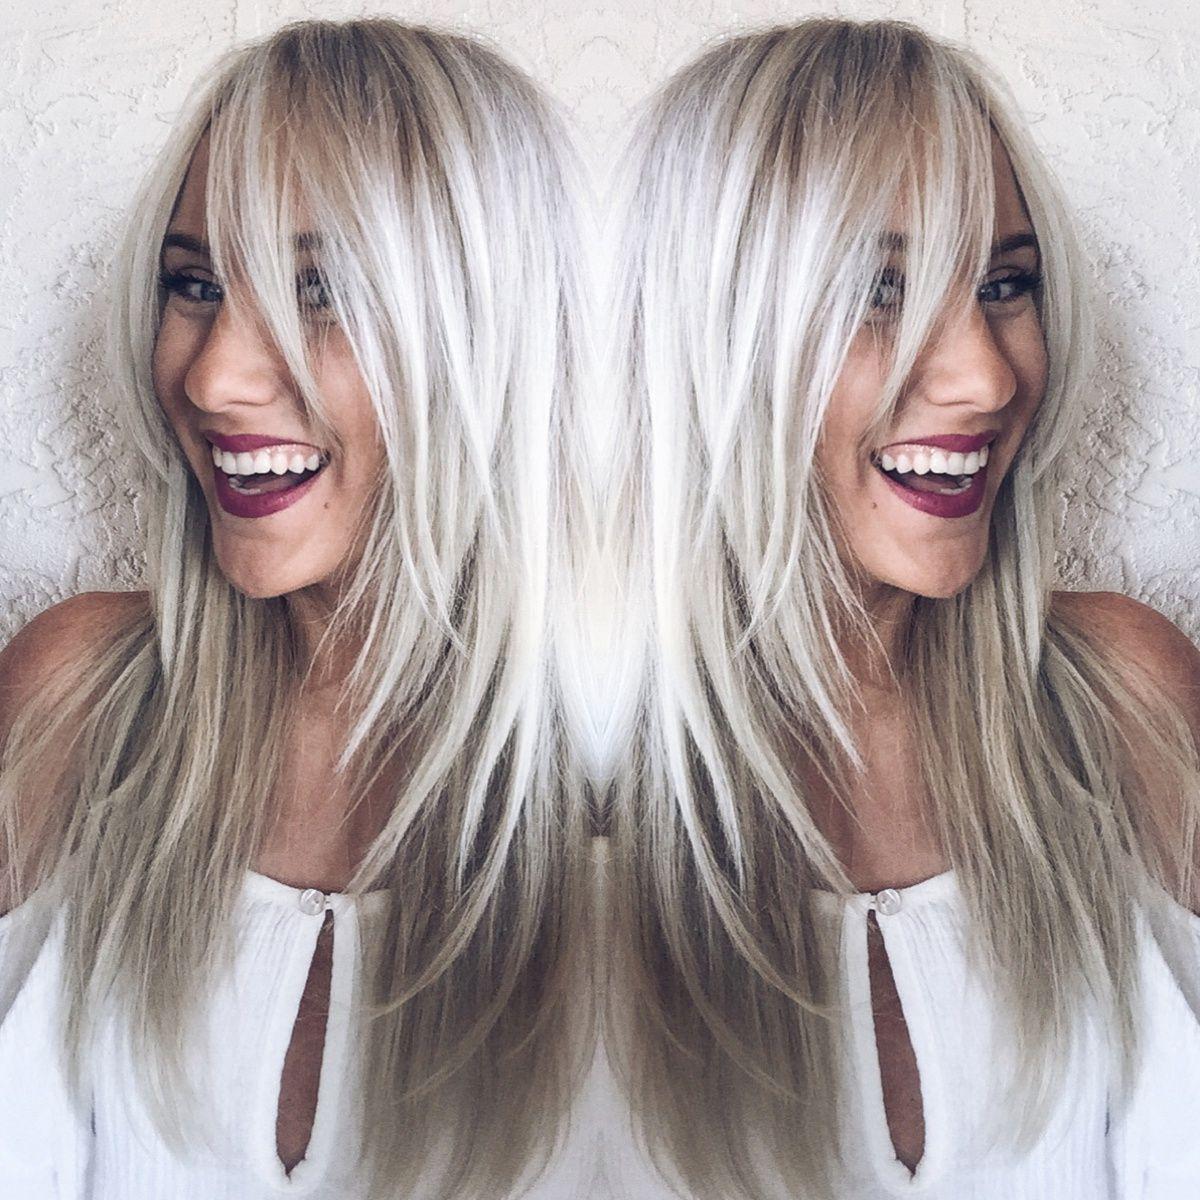 Long Fringed Bangs Bridget Bardot Inspired Blonde Hair Icy Cool